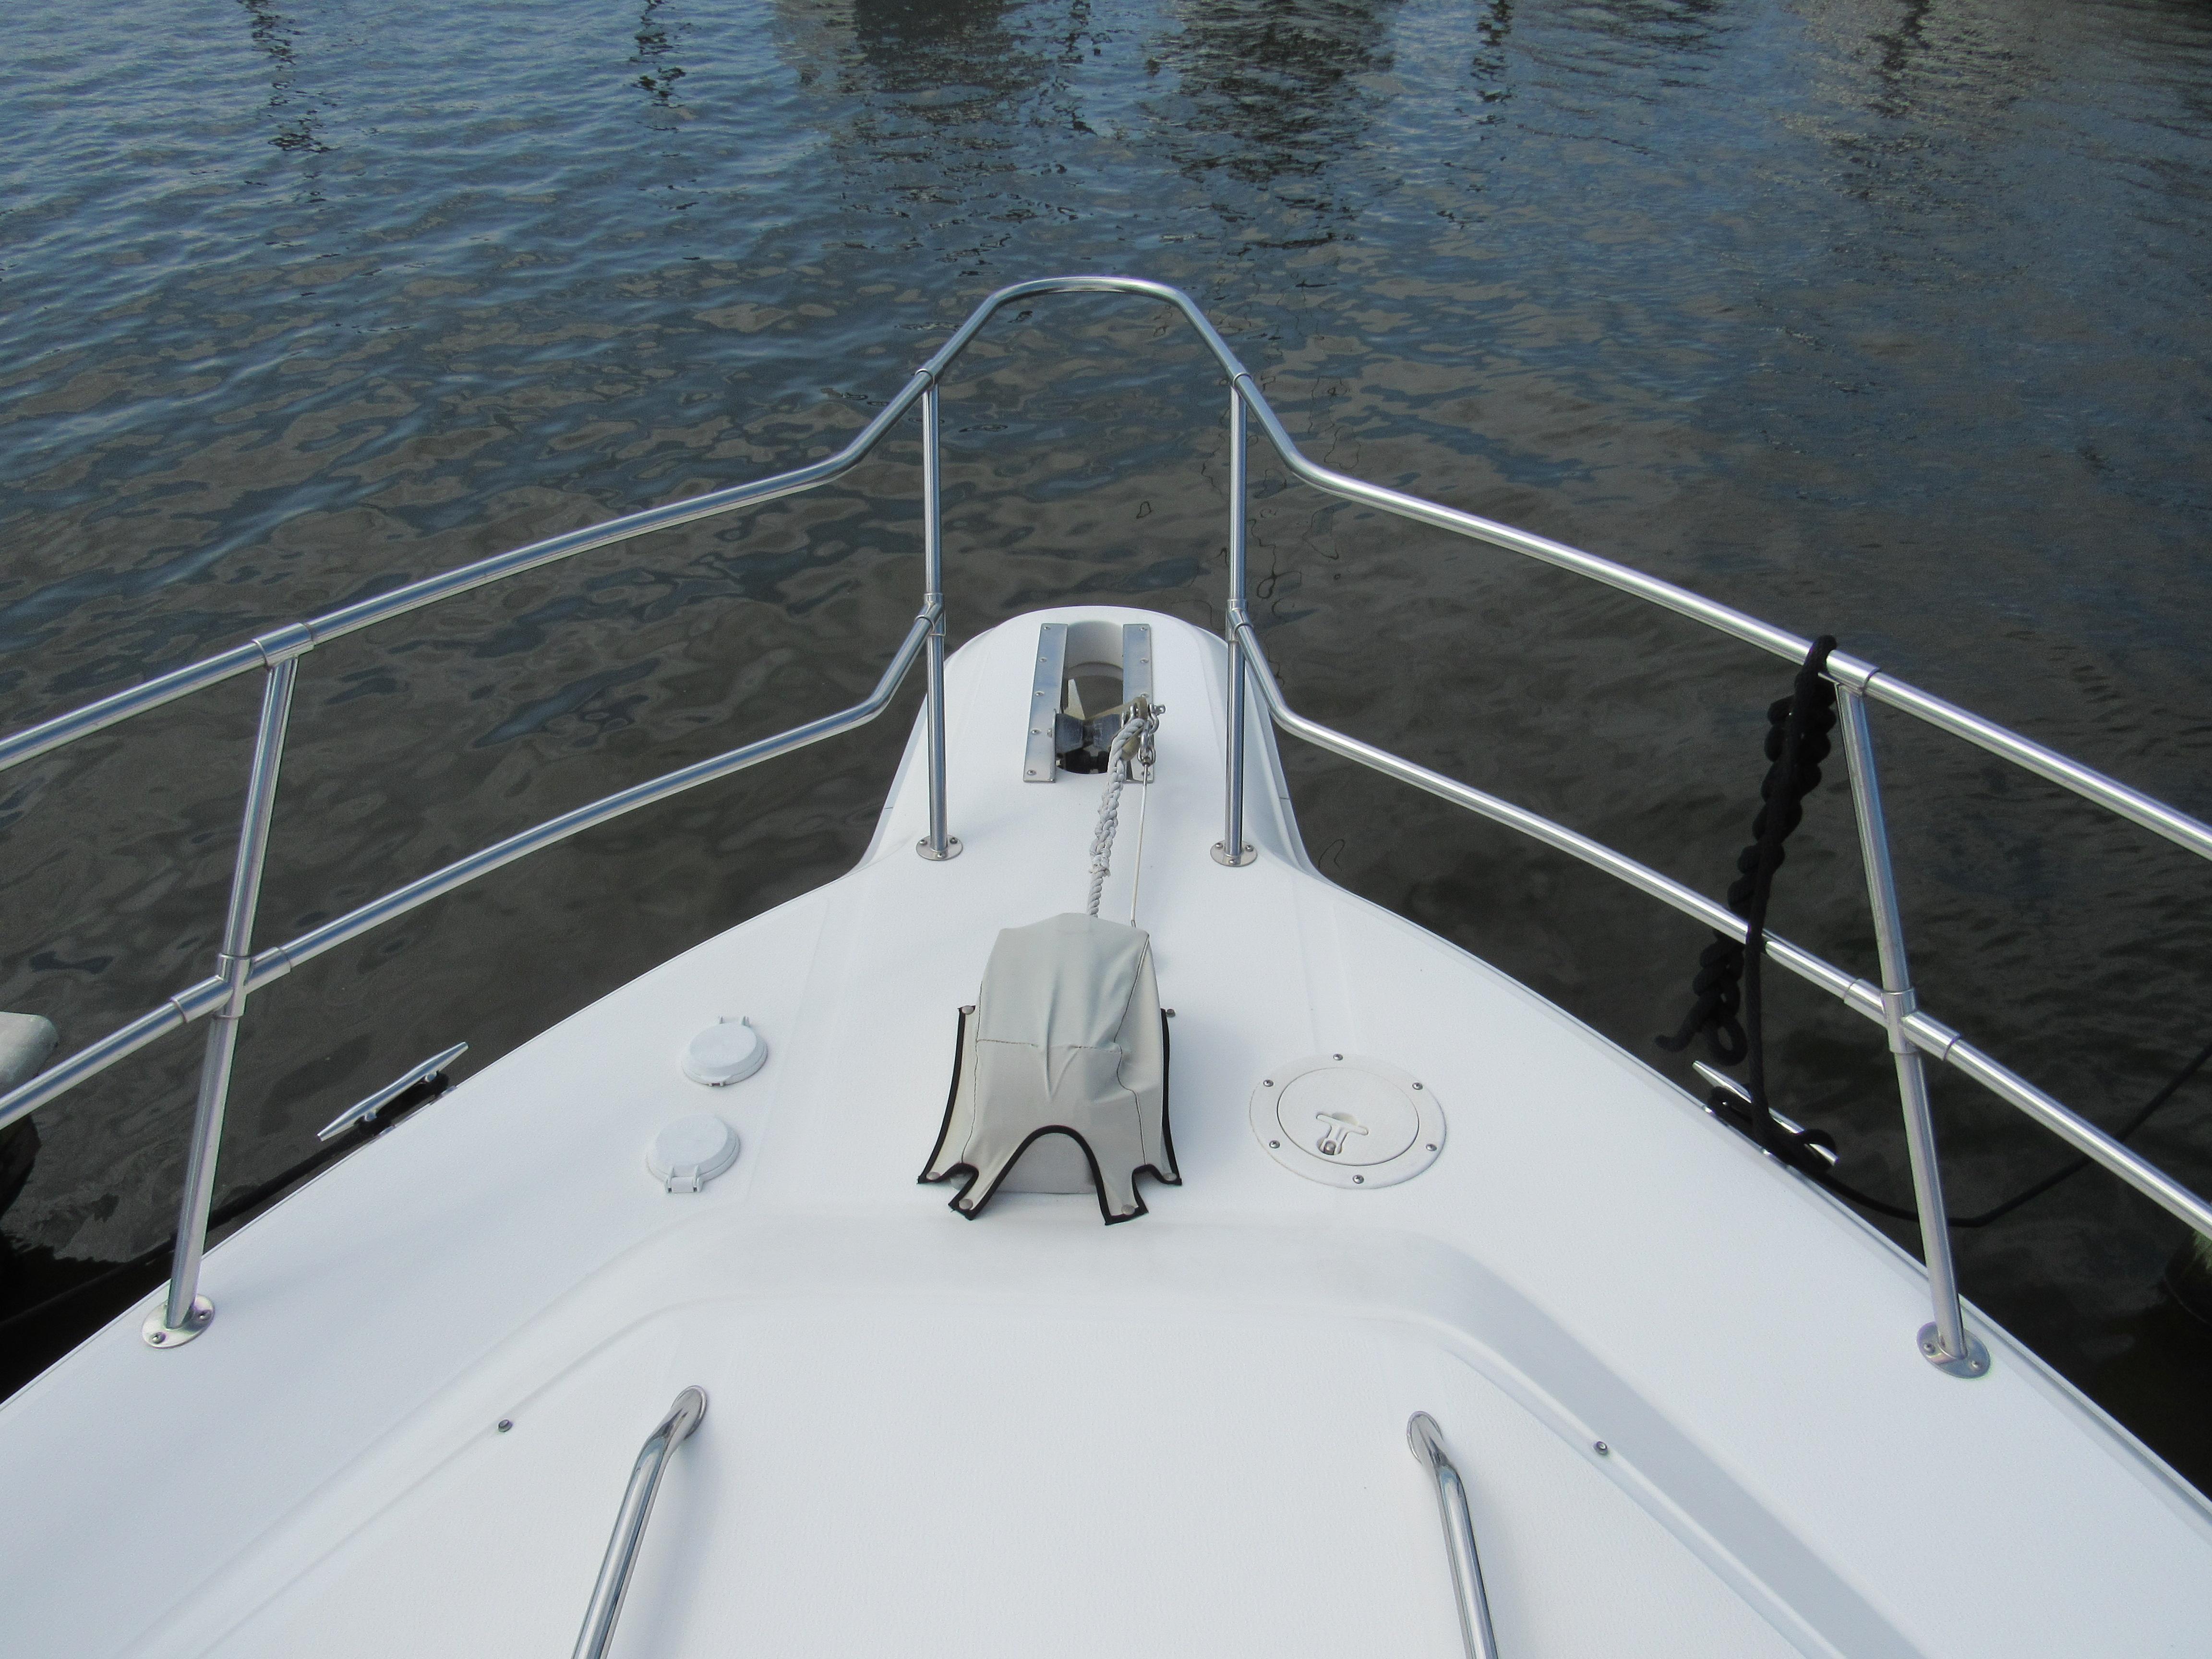 Anchor Windlass & Bow Pulpit